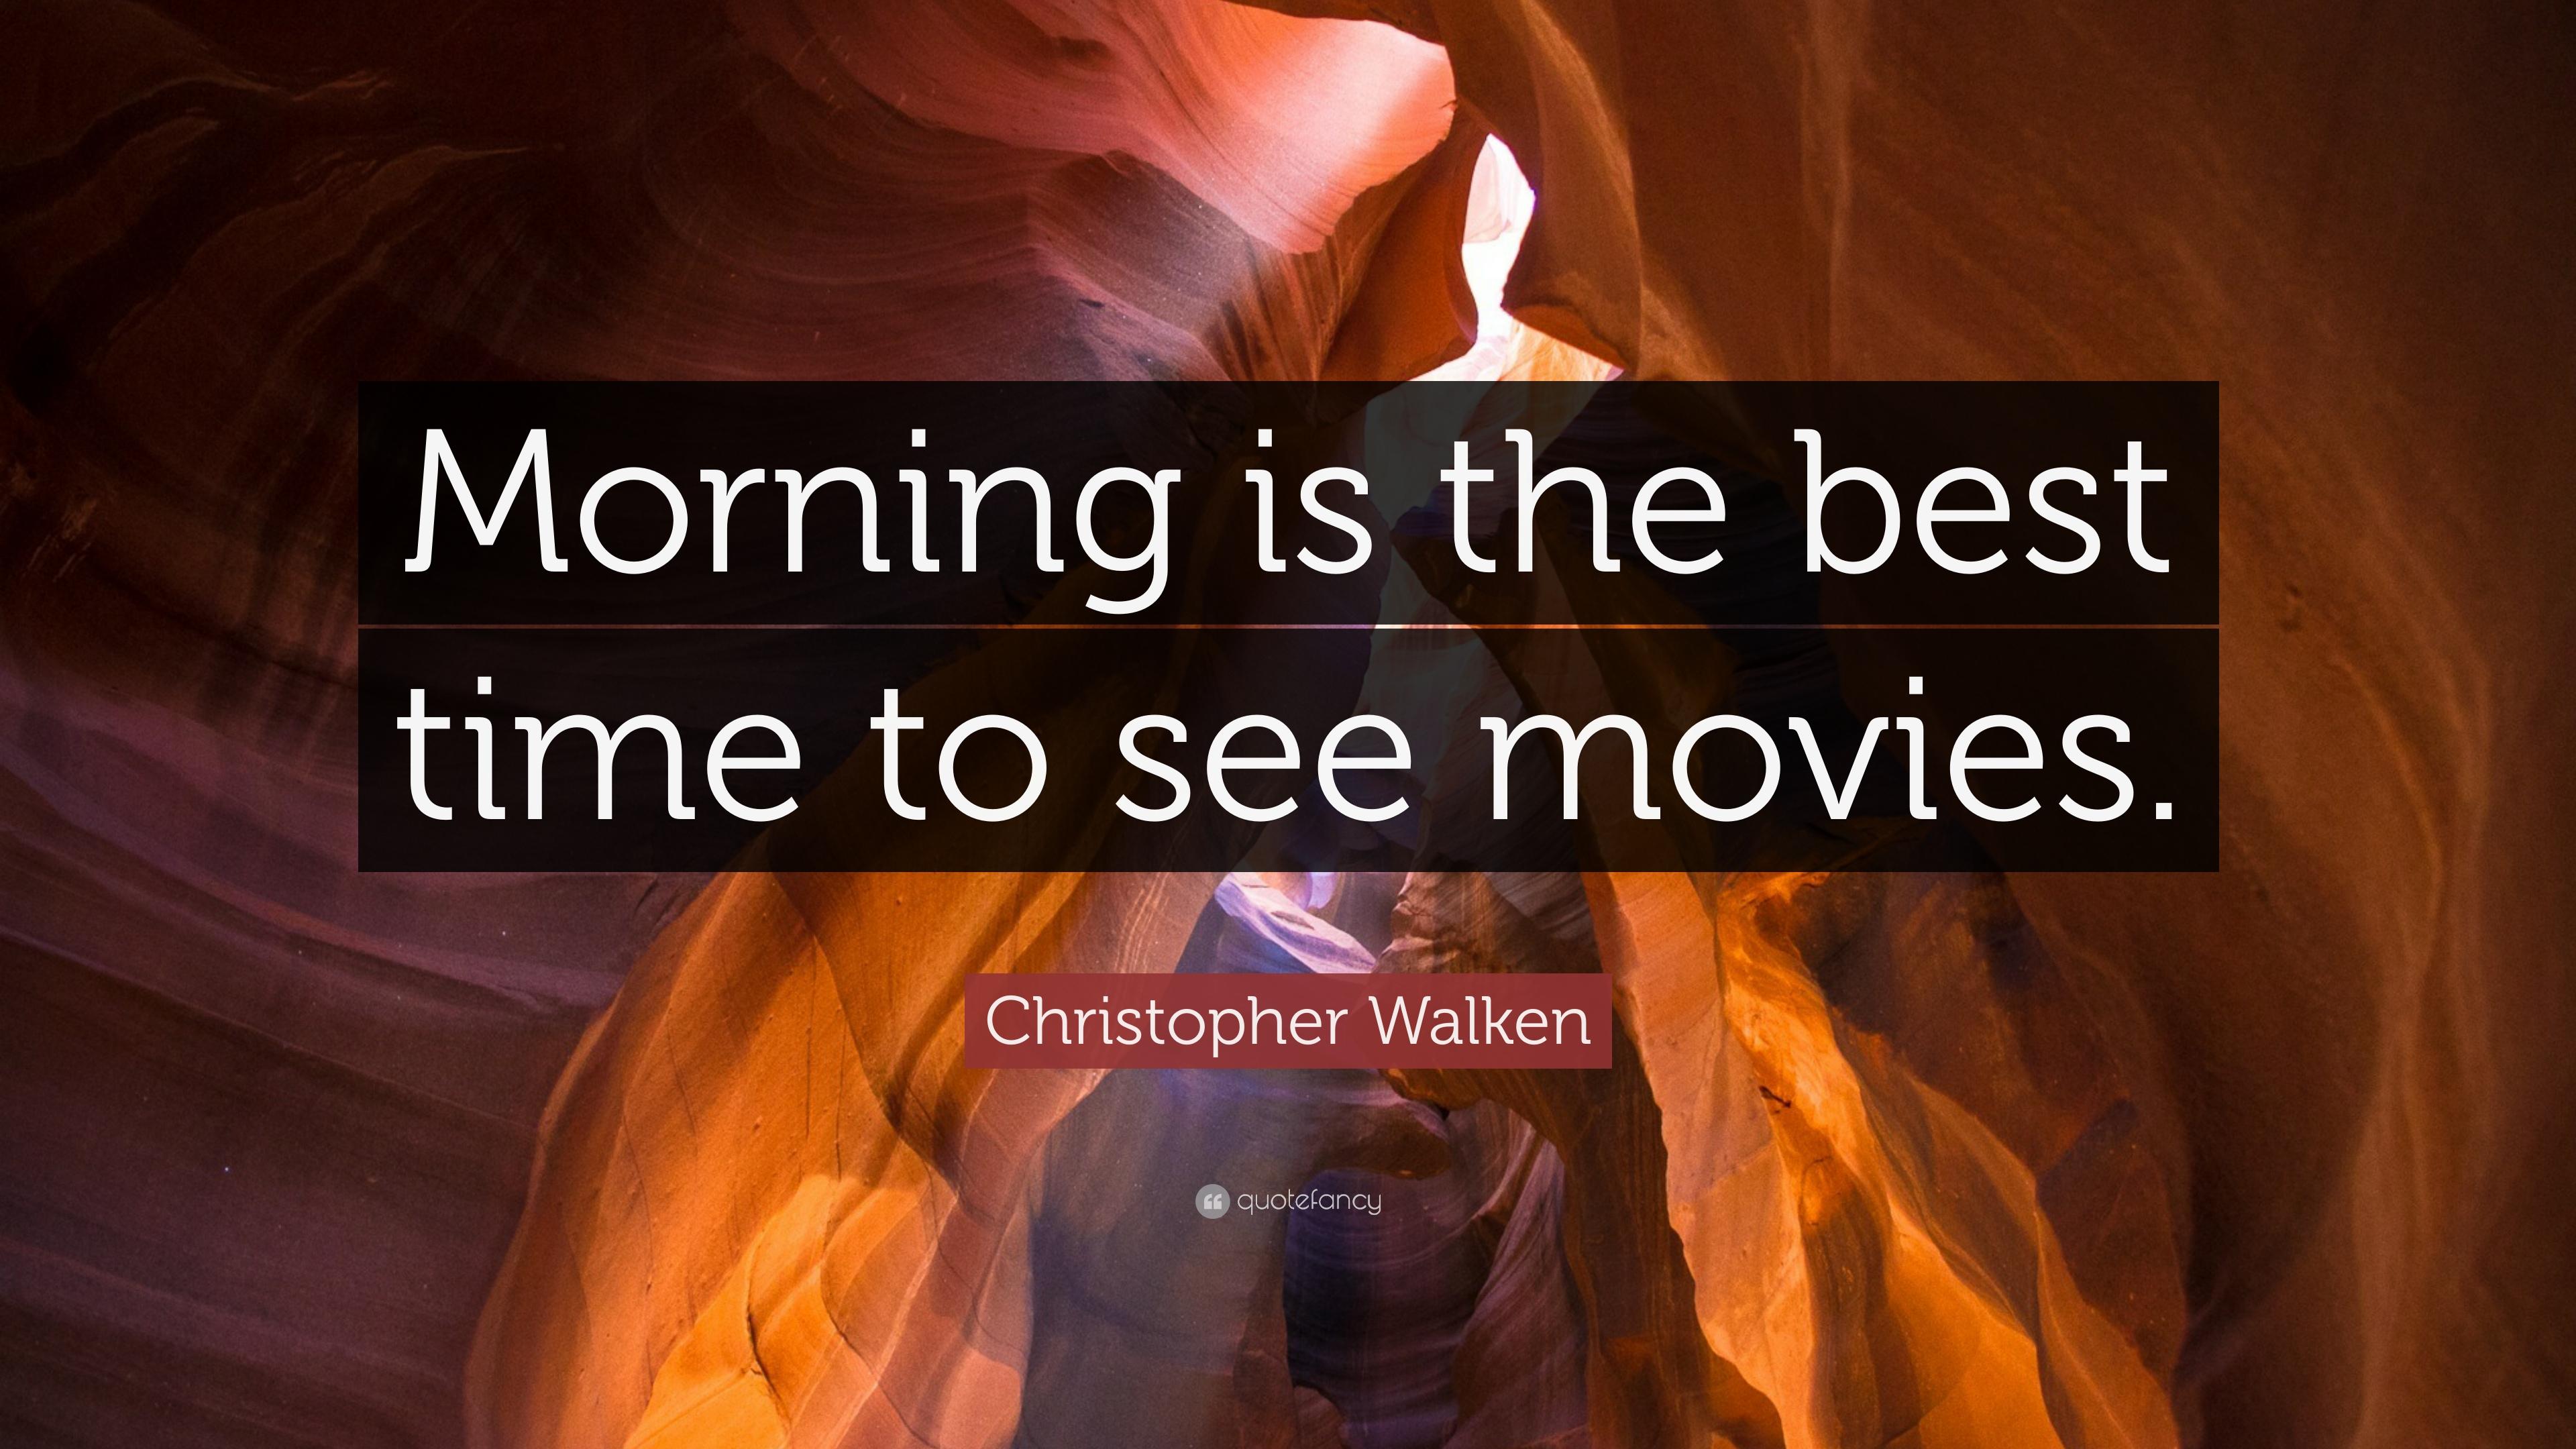 Christopher Walken Movie Quotes Facebook thumbnail